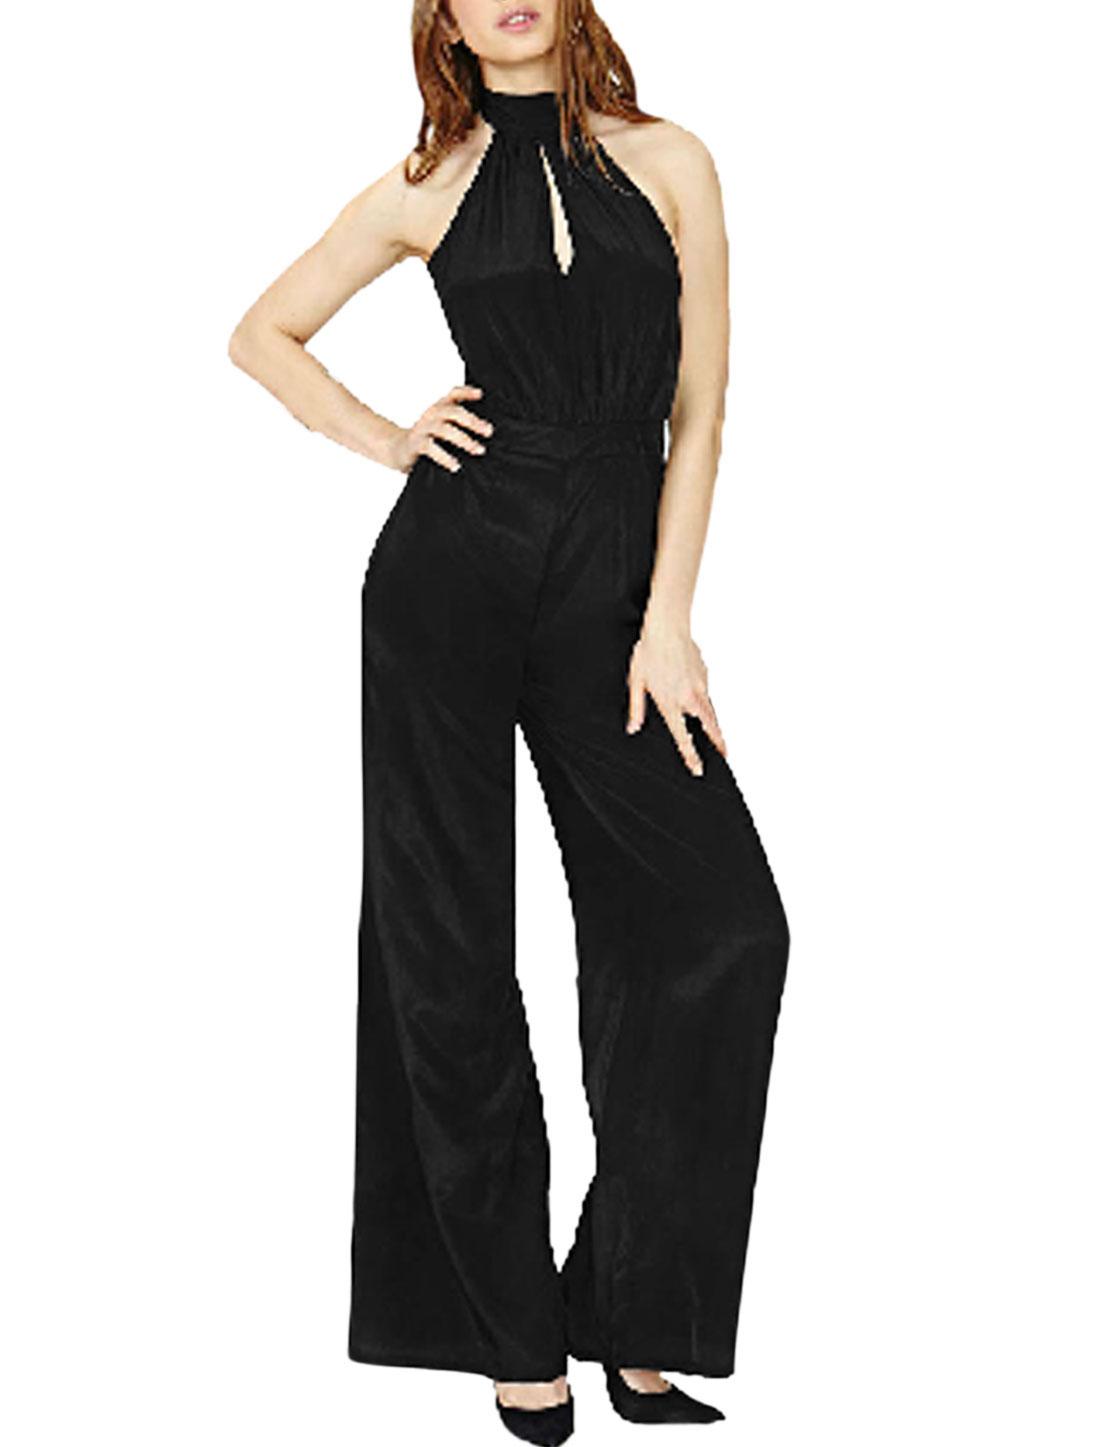 Women Halter Neck Sleeveless Backless Wide Legs Jumpsuits Black M